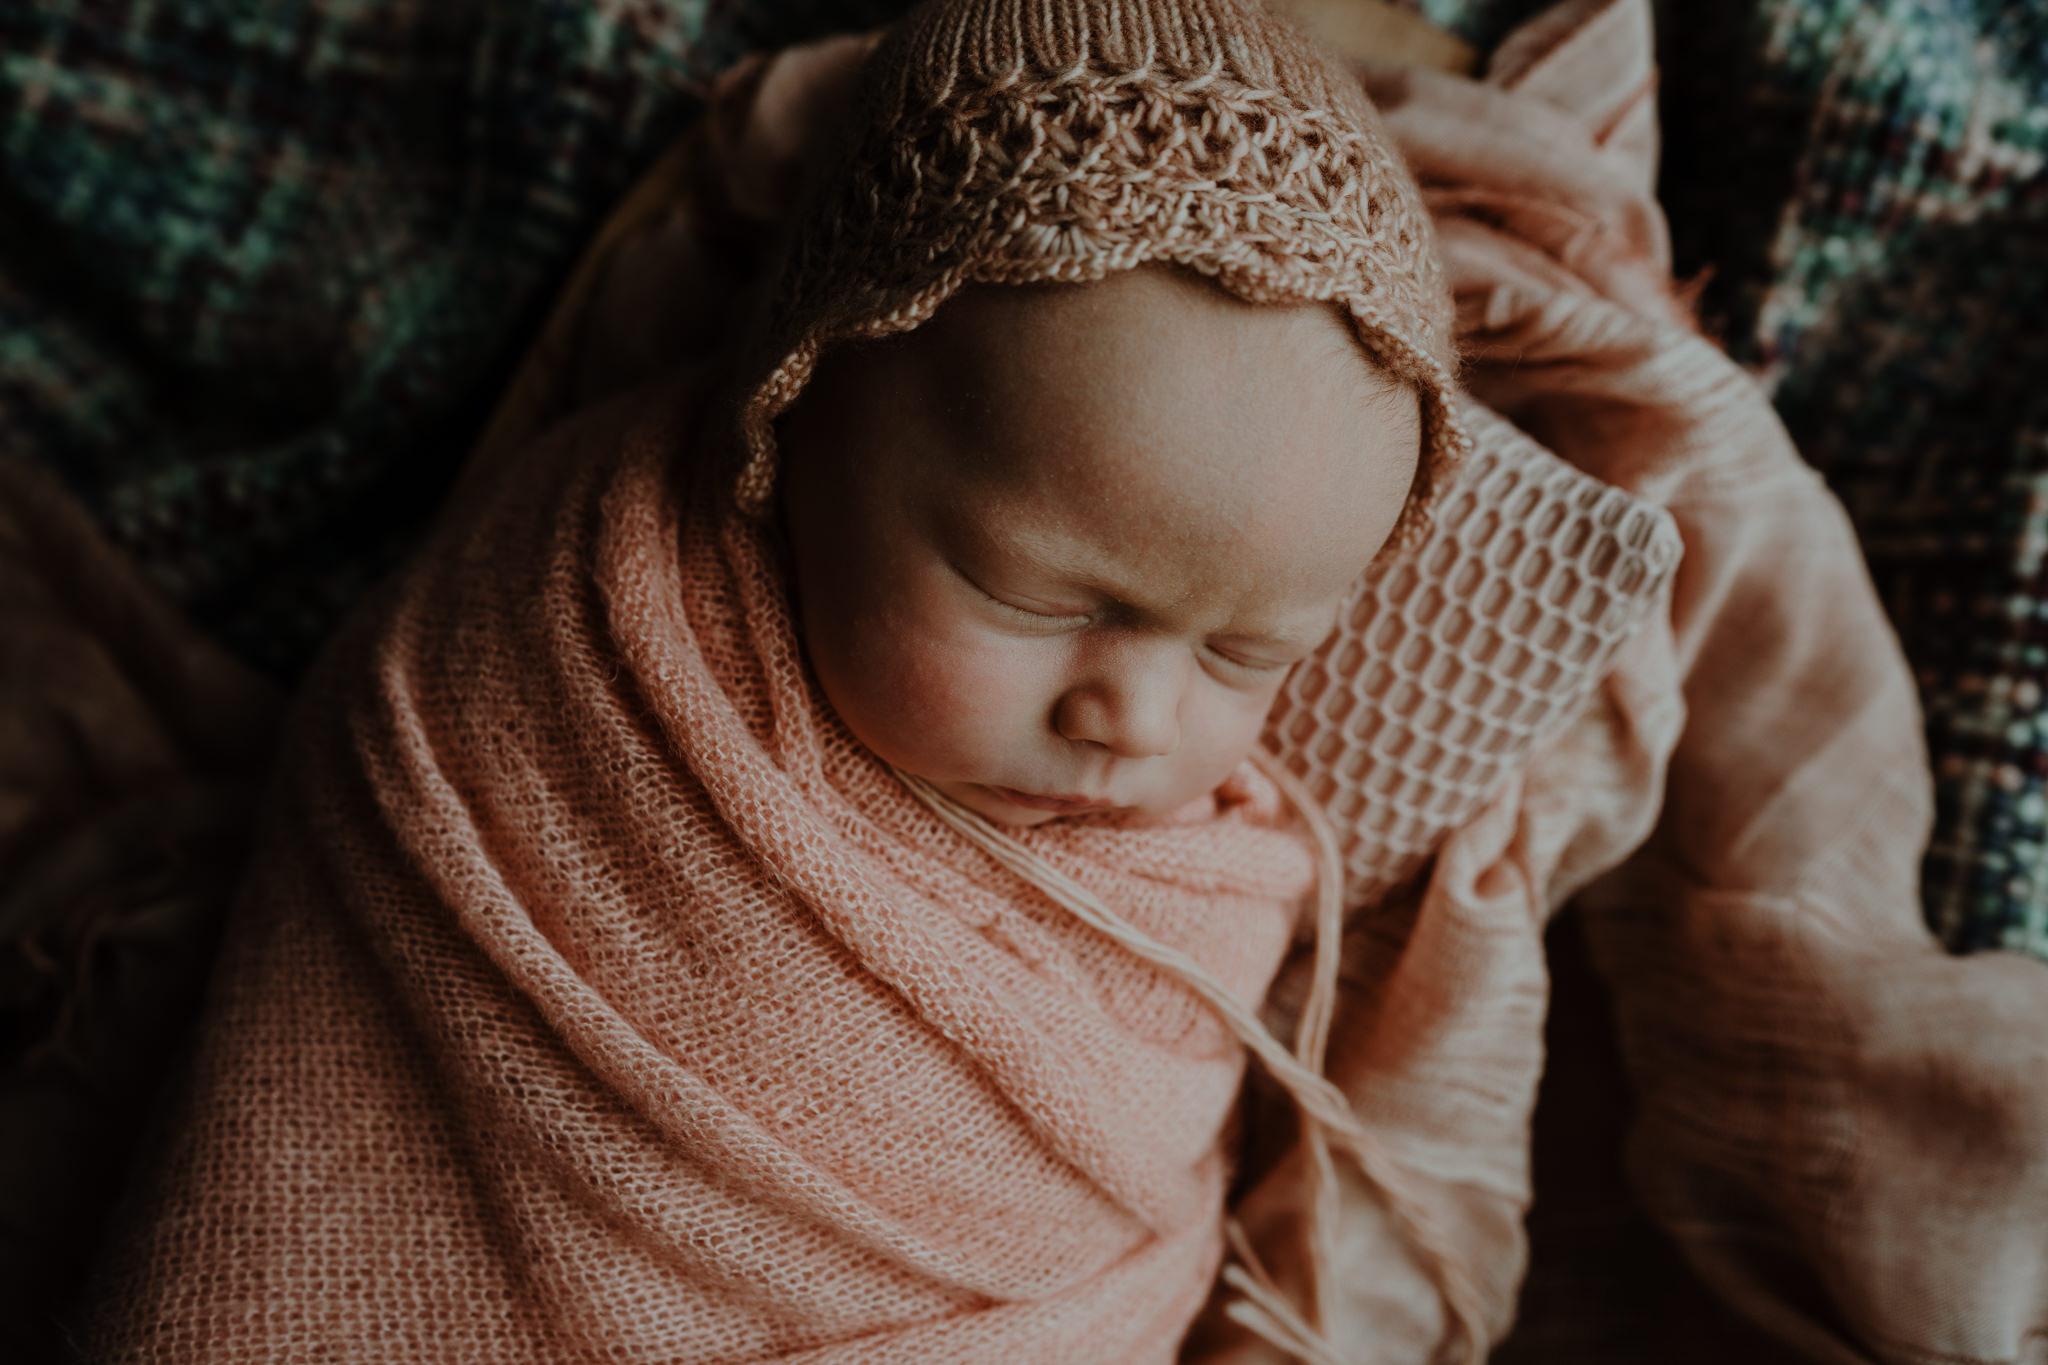 newborn-photographer-belfast-the-snug-sessions-Nora-2.jpg